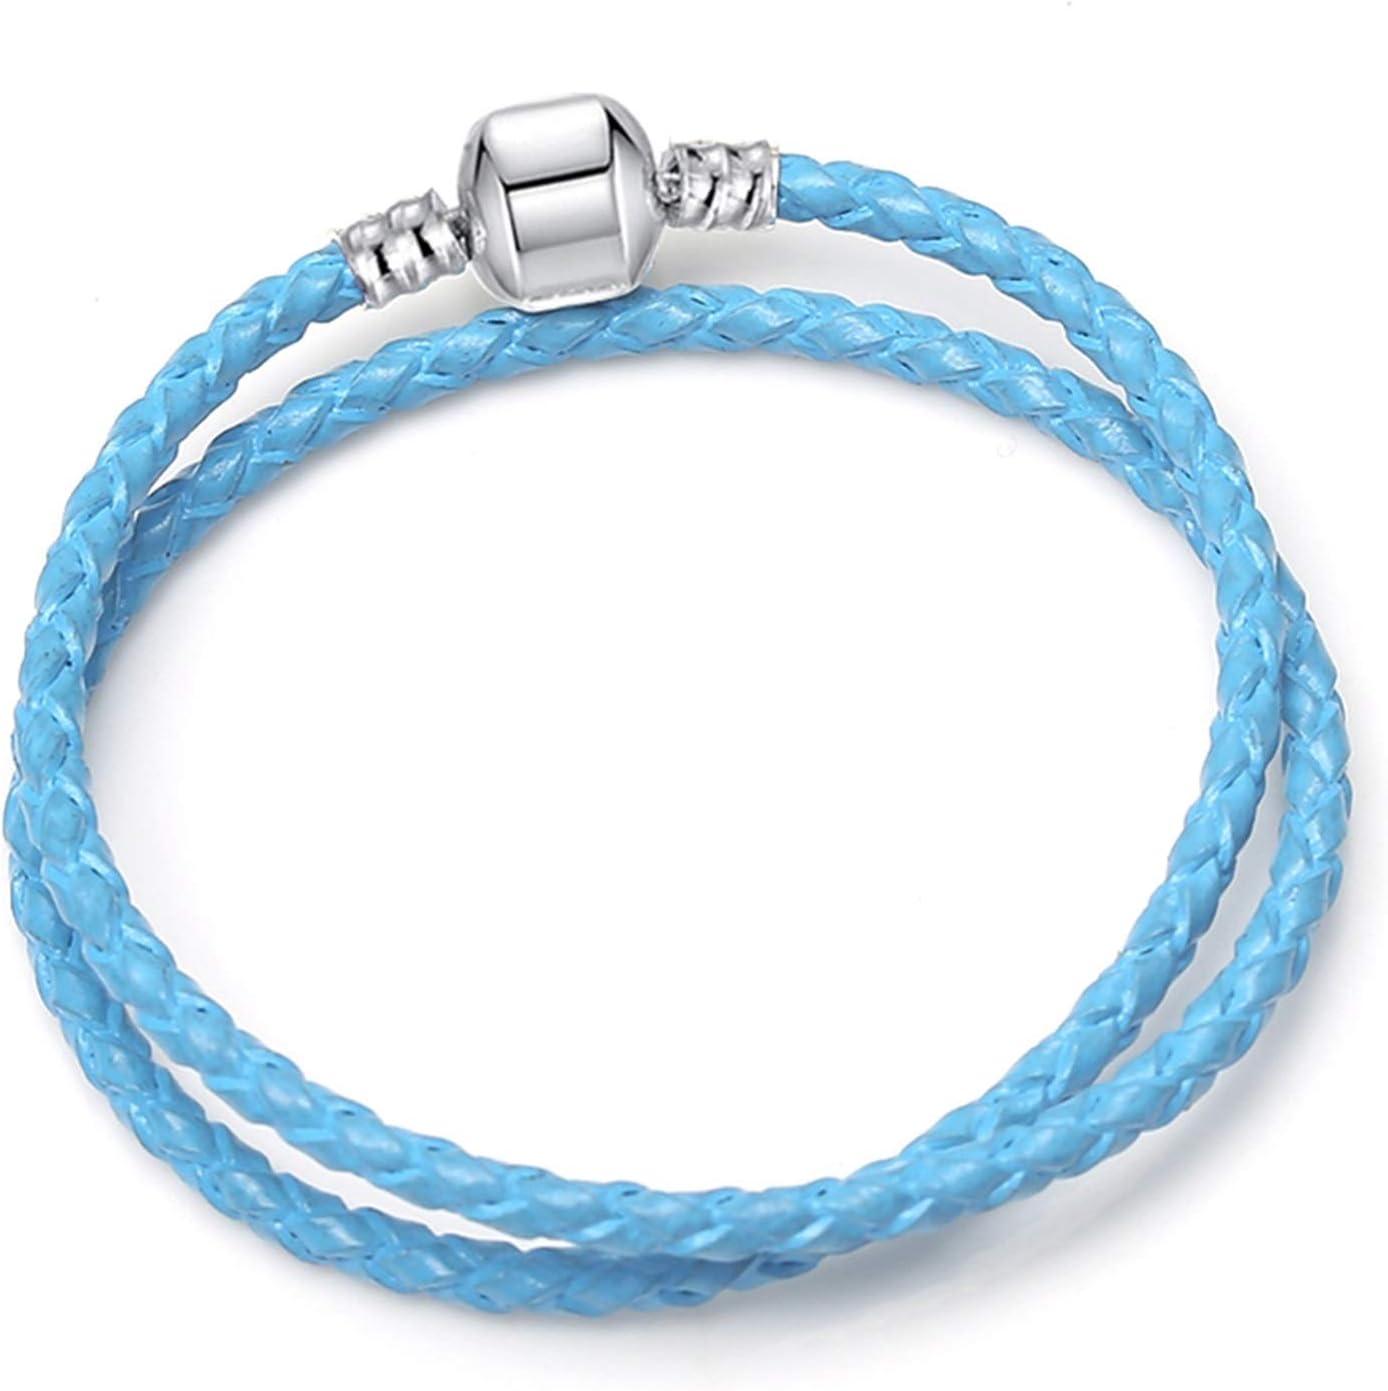 WANGJINQIAO Charm Bracelet Cute Mouse Snake Chain Basic Bra Weekly update fine Max 84% OFF